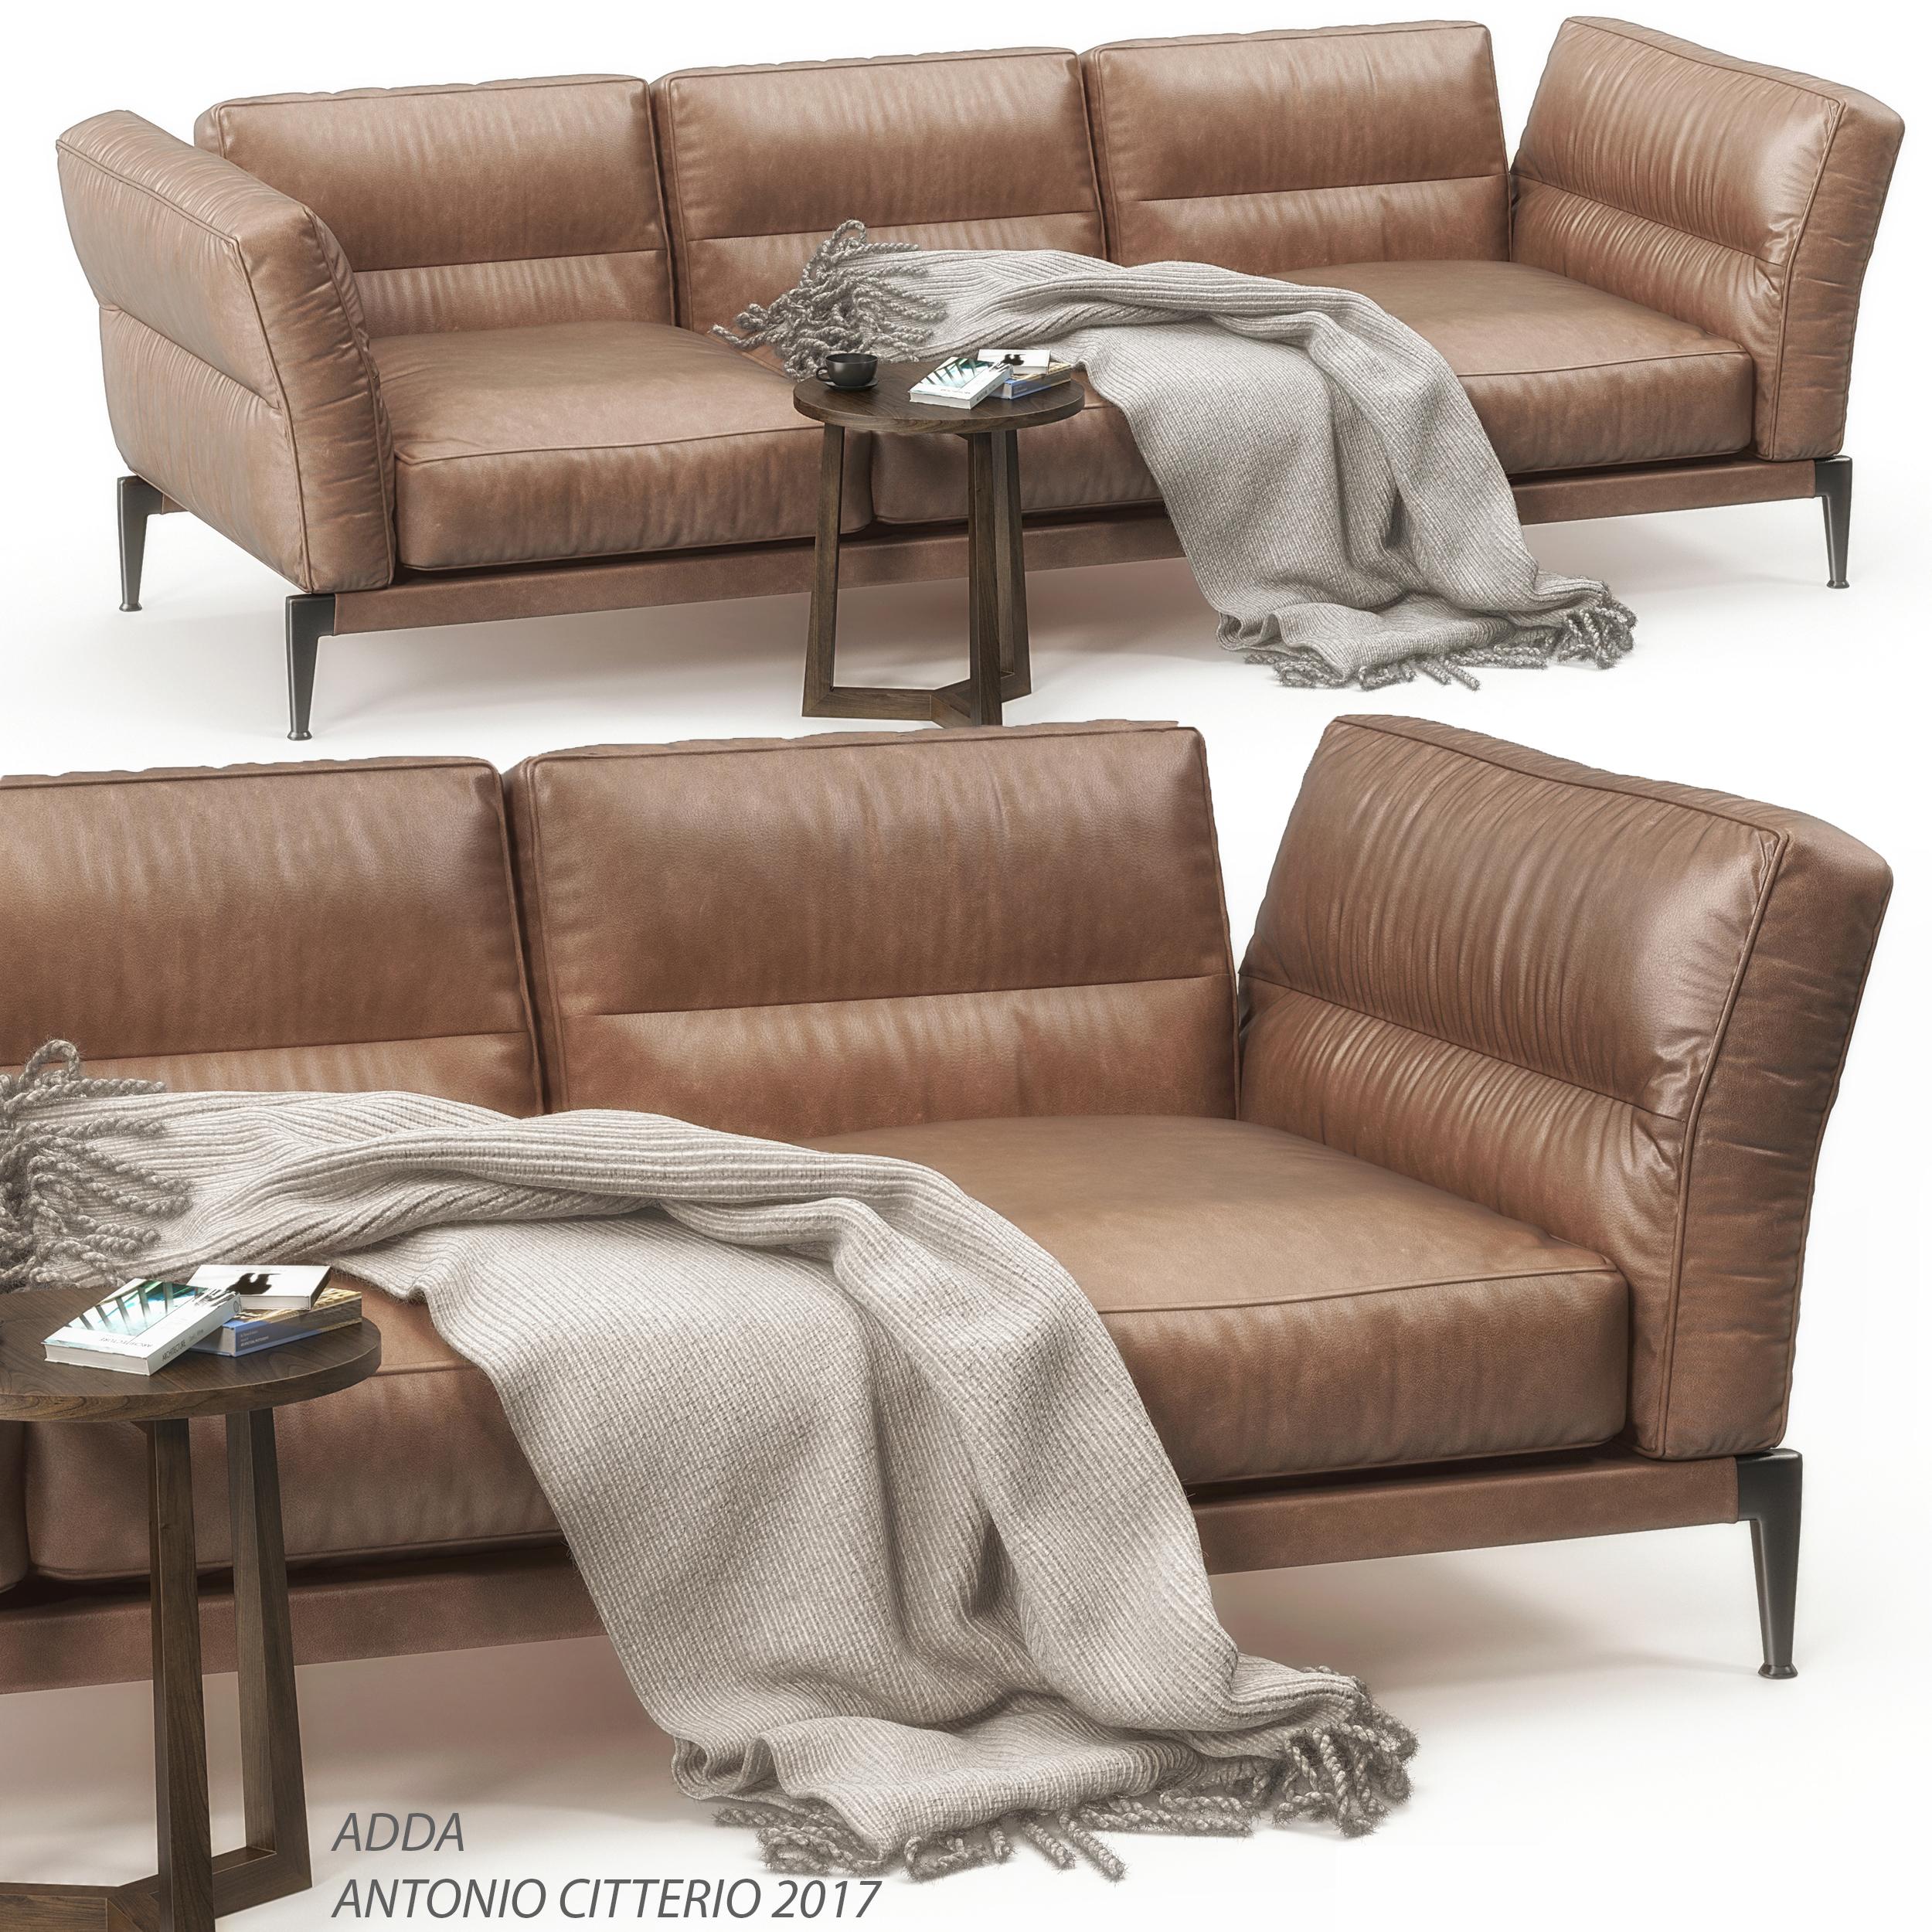 Full Size of Flexform Sofa Sale Groundpiece Gebraucht Cost Review Bed Eden Furniture List Uk Romeo Adda Sofagarnitur 3d Modell Turbosquid 1151532 Chippendale Halbrundes Mit Sofa Flexform Sofa